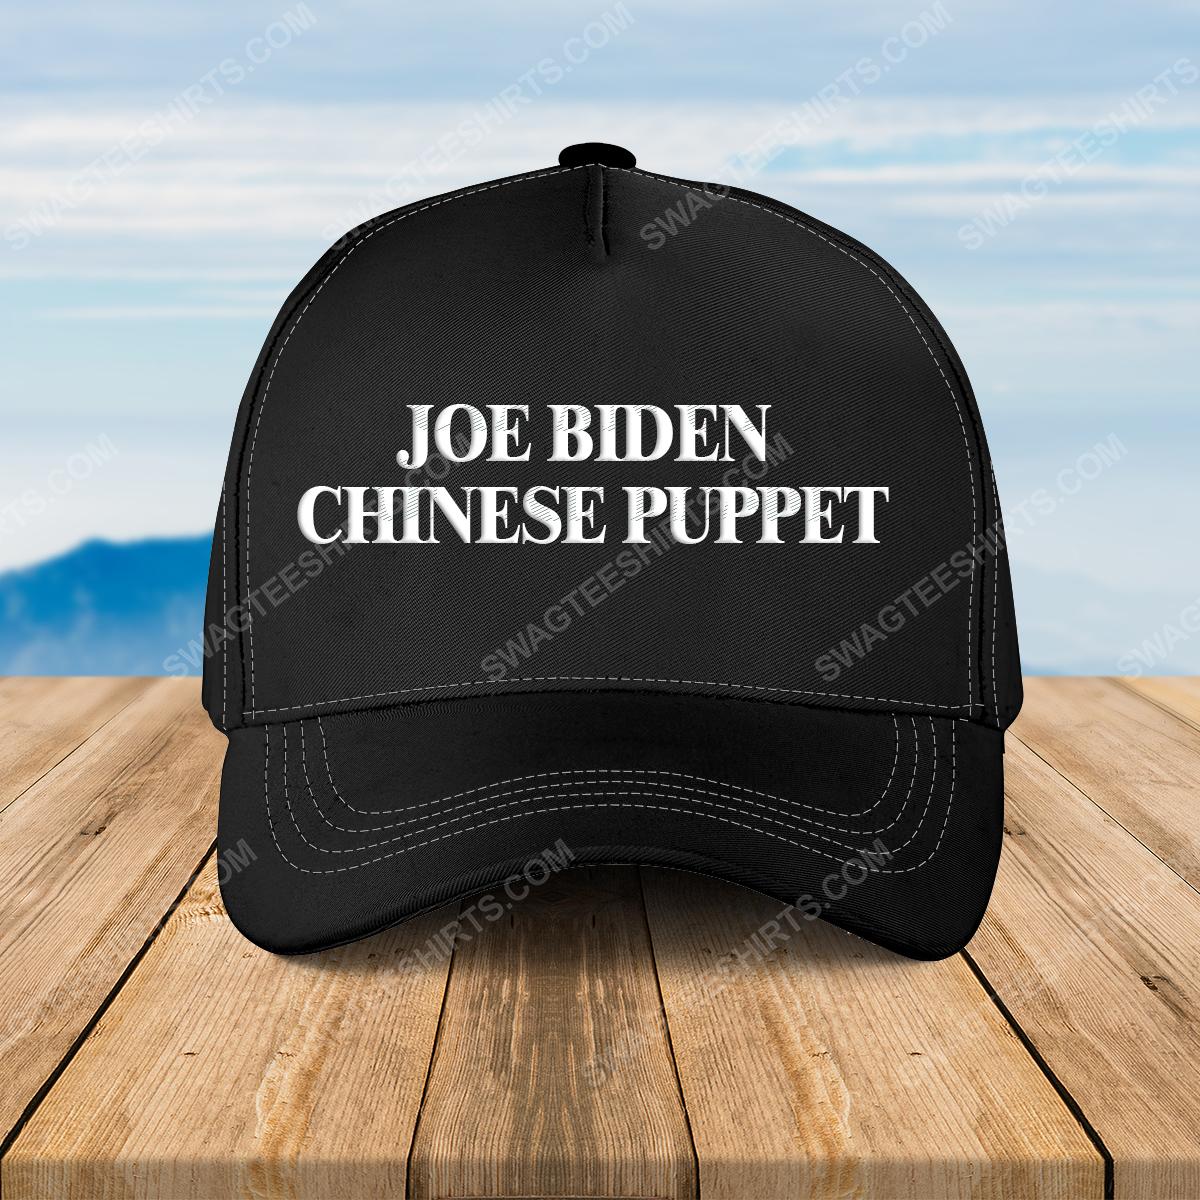 Joe biden chinese puppet full print classic hat 1 - Copy (3)